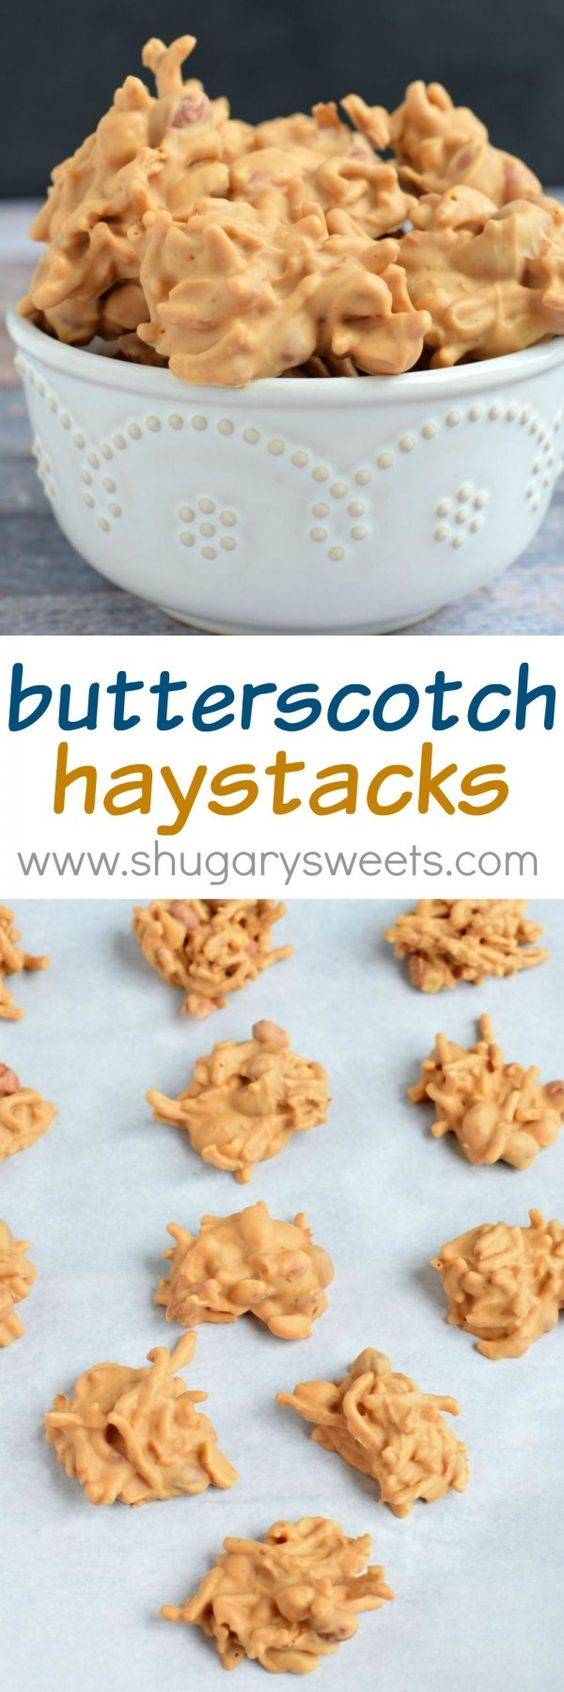 haystack cookies cookies and butterscotch haystacks on